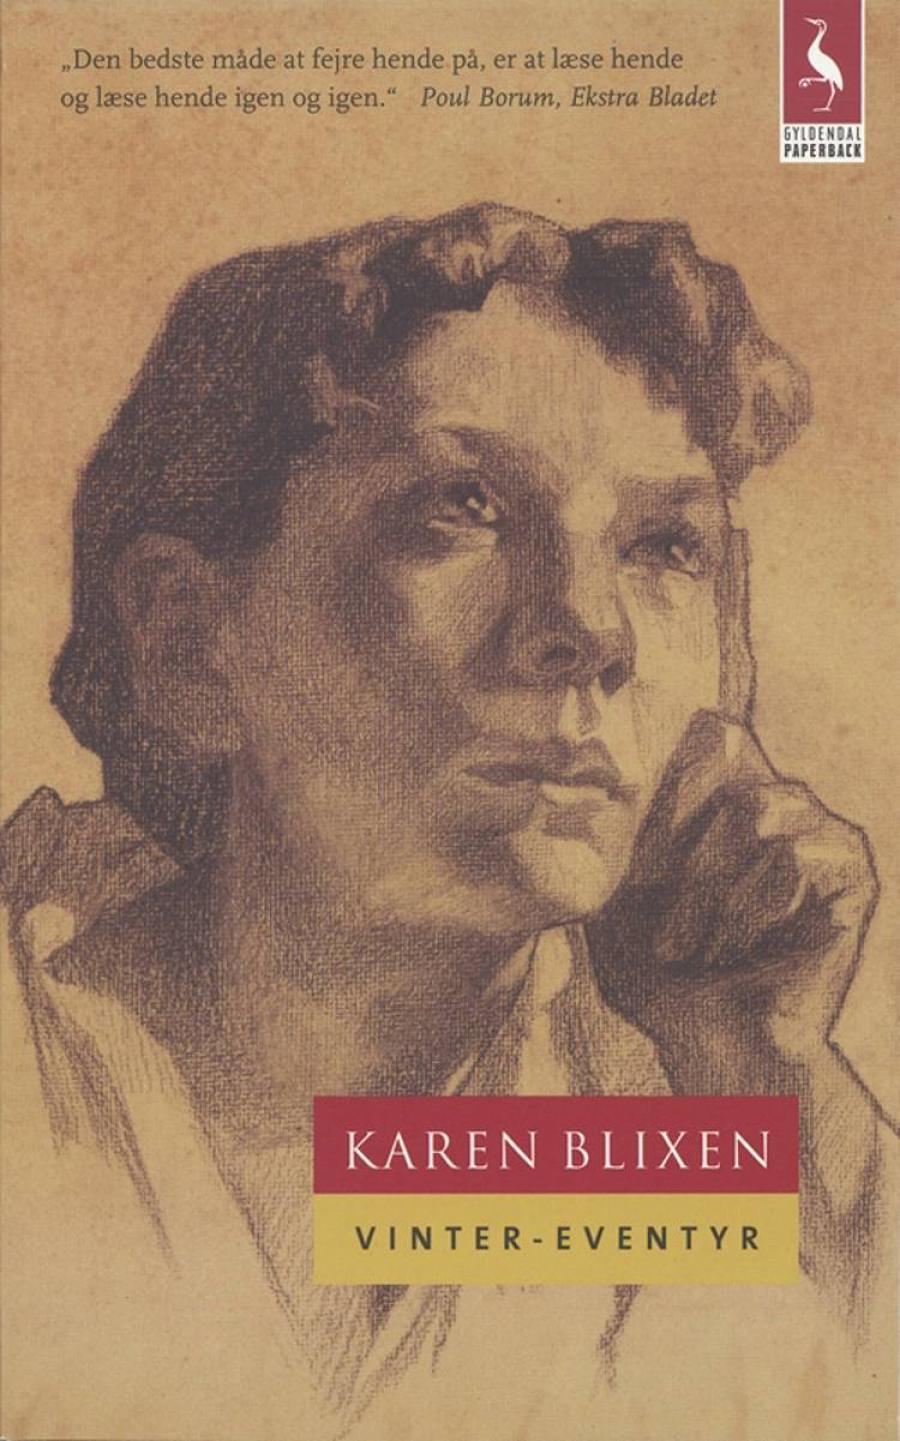 Vinter-eventyr, Karen Blixen, Gyldendal